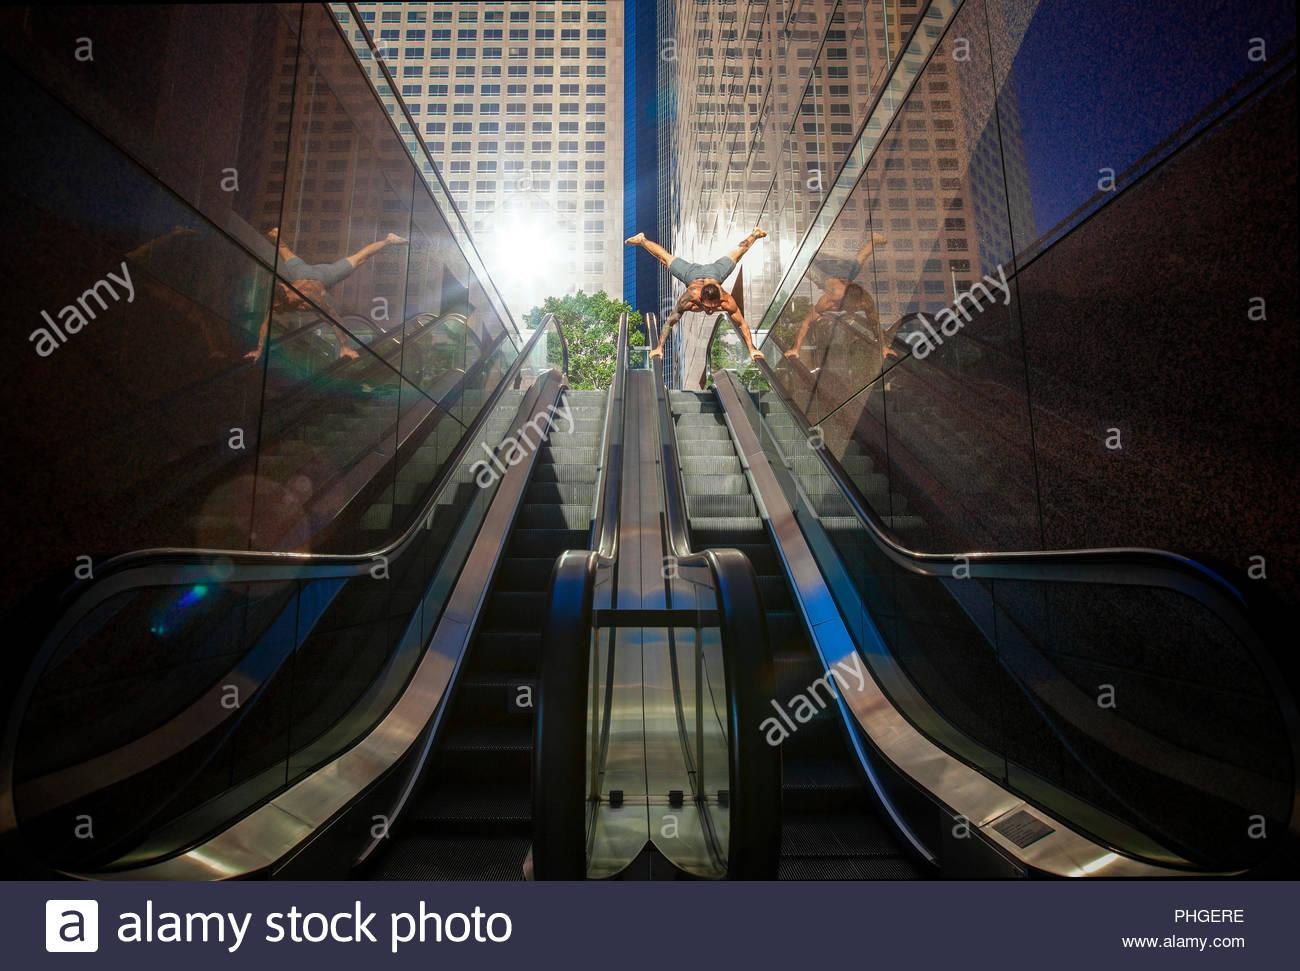 Shirtless uomo facendo handstand su escalator Immagini Stock